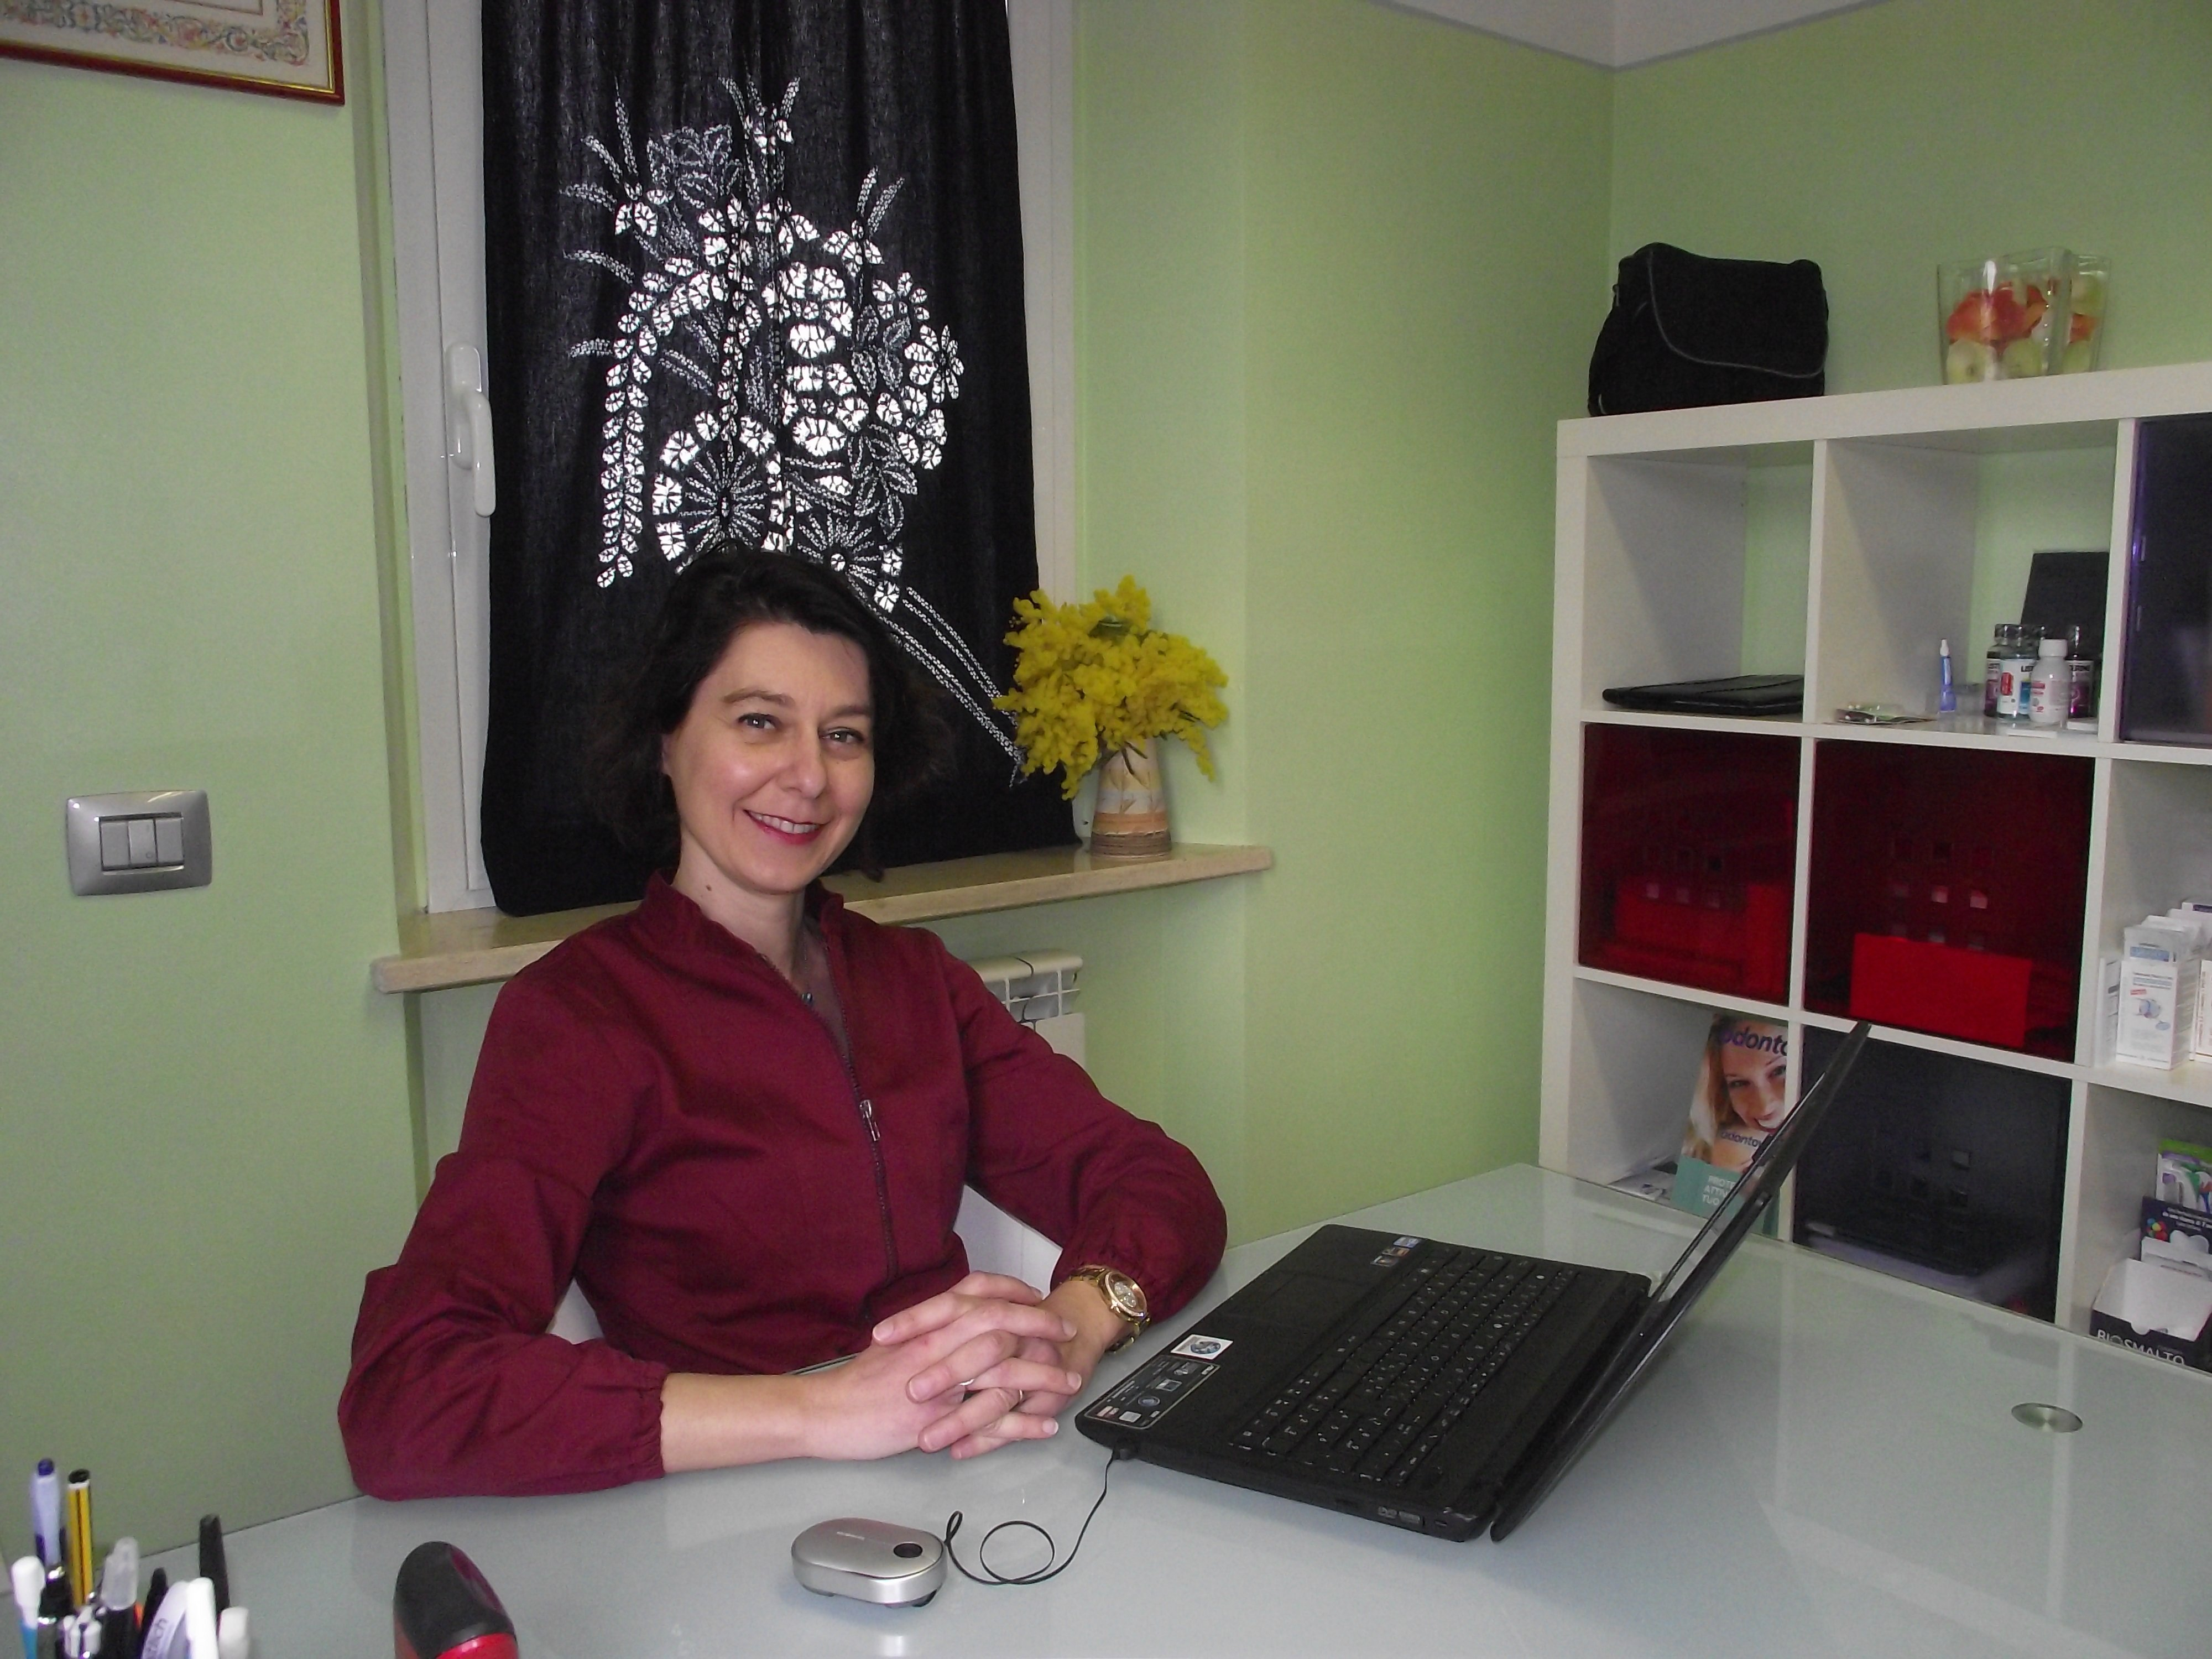 La Dott.ssa Stefania Marini